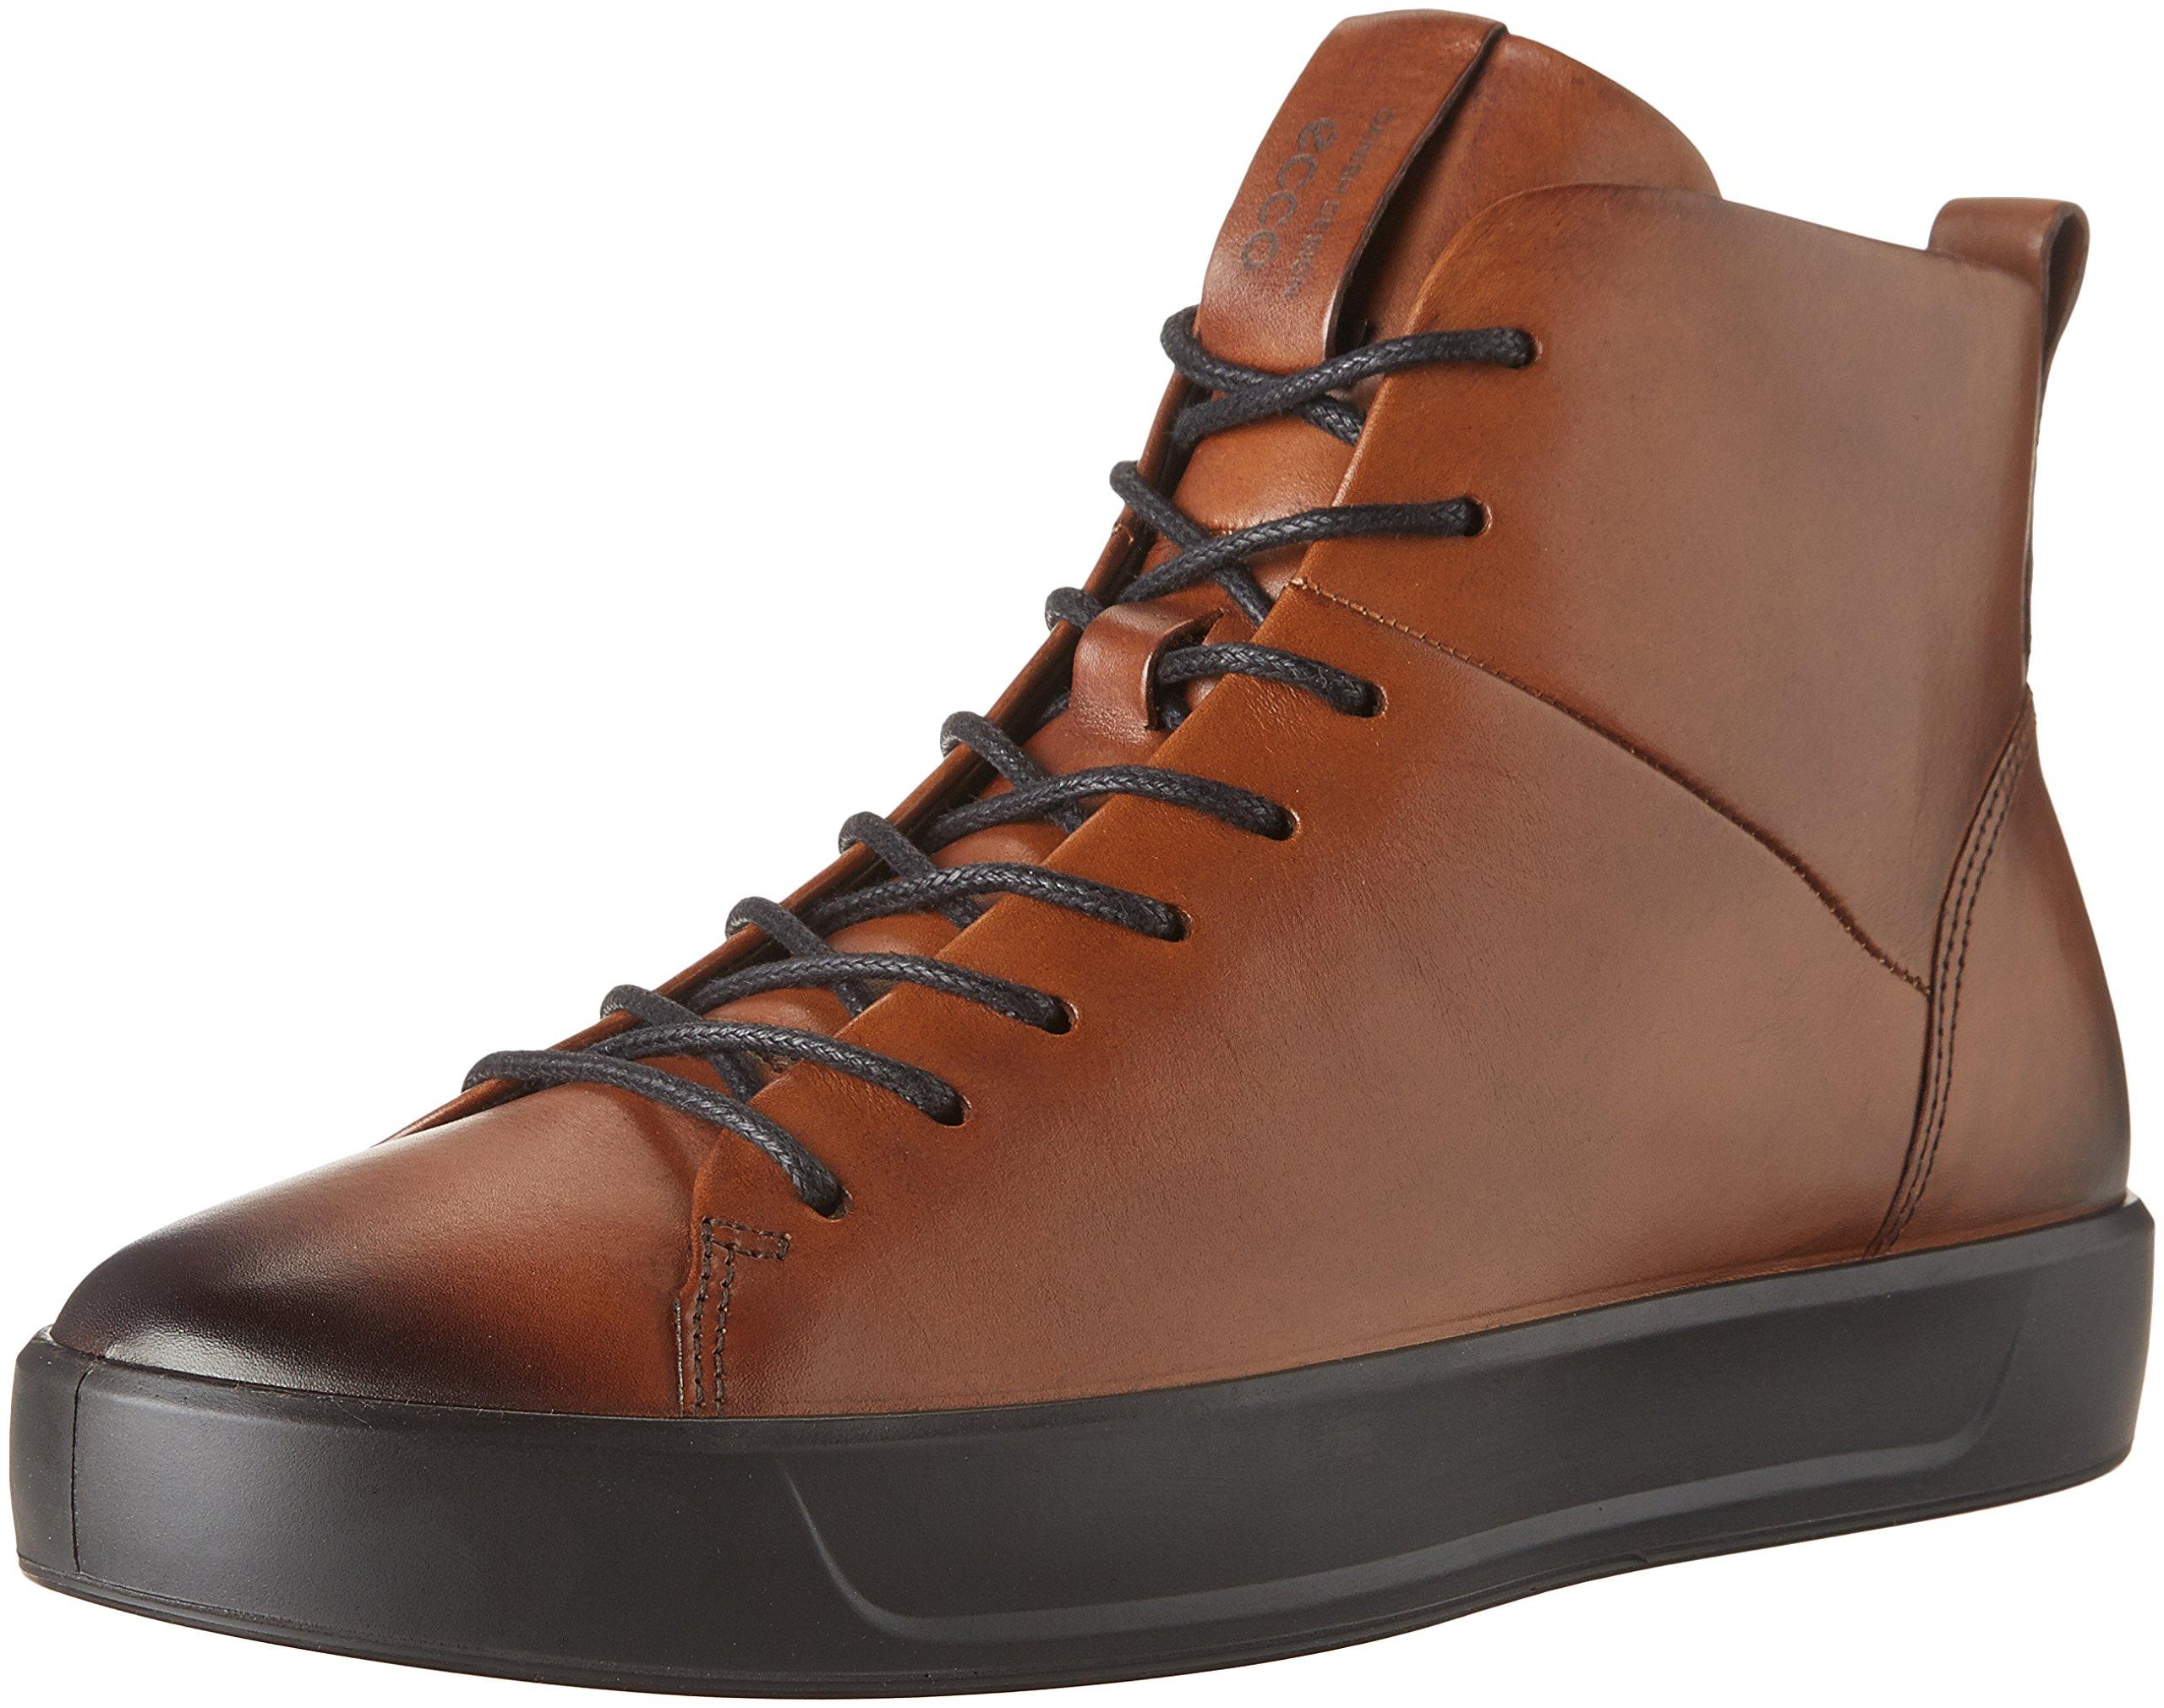 ECCO Men's Soft 8 High Top Fashion Sneaker, Lion, 46 M EU / 12-12.5 D(M) US